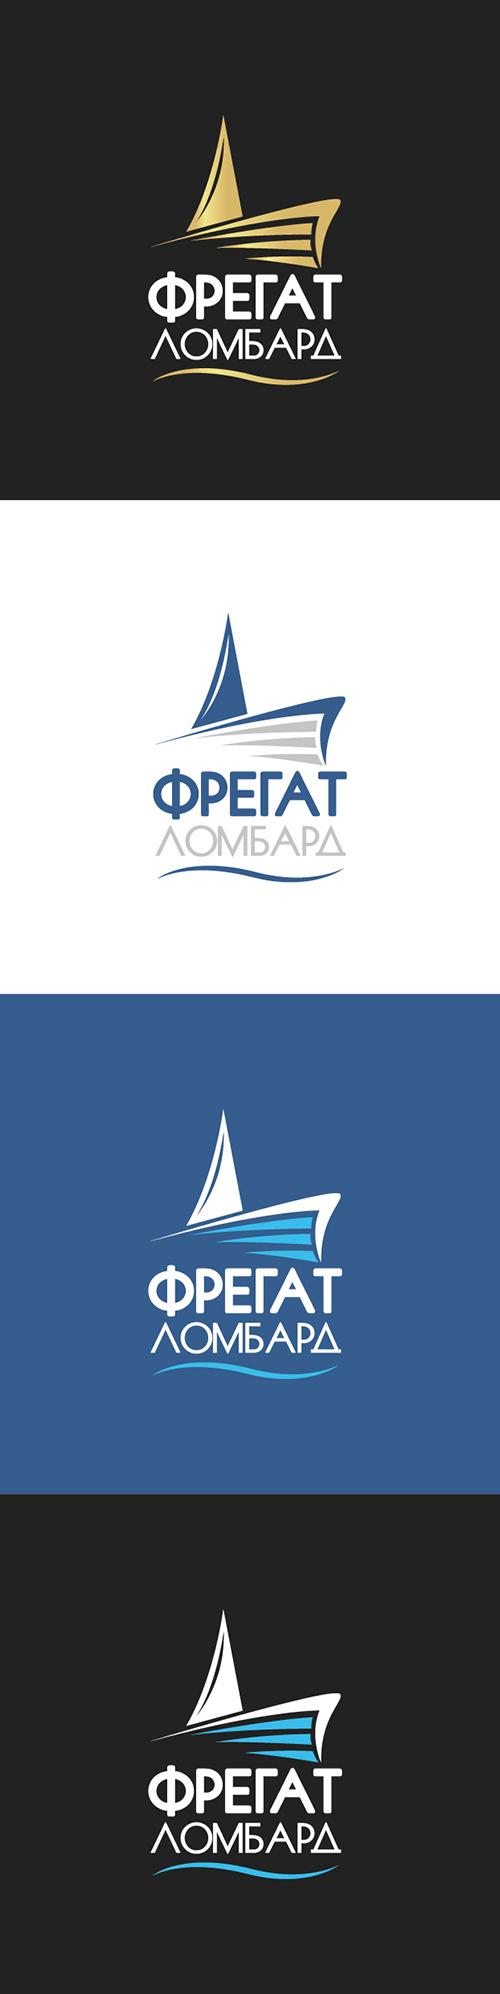 "Логотип, фирменный стиль Ломбард ""Фрегат"" фото f_7005bc09c0e92f7b.jpg"